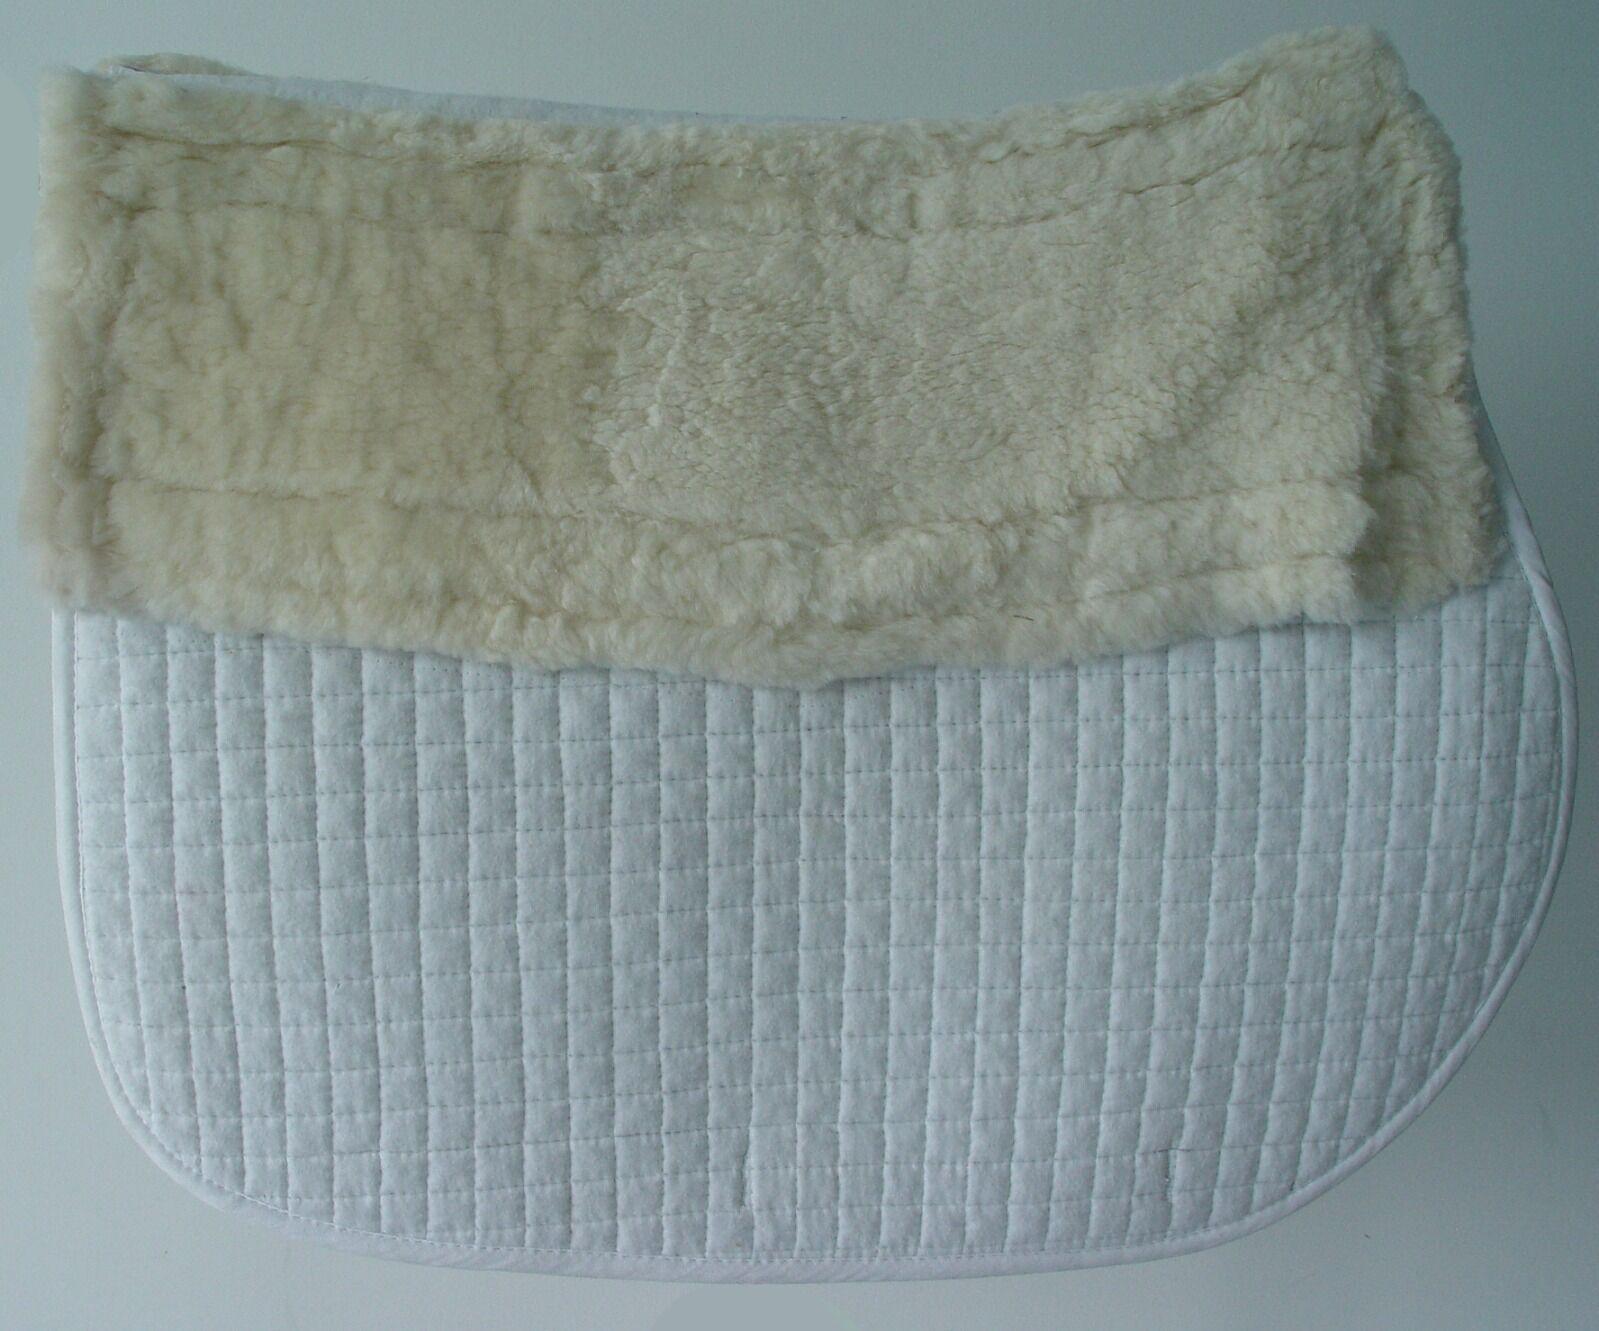 Sheepskin AP Pad, Detachable, Spine Channeled, High High High Wither, EquuFelt, bianca f3ba1a